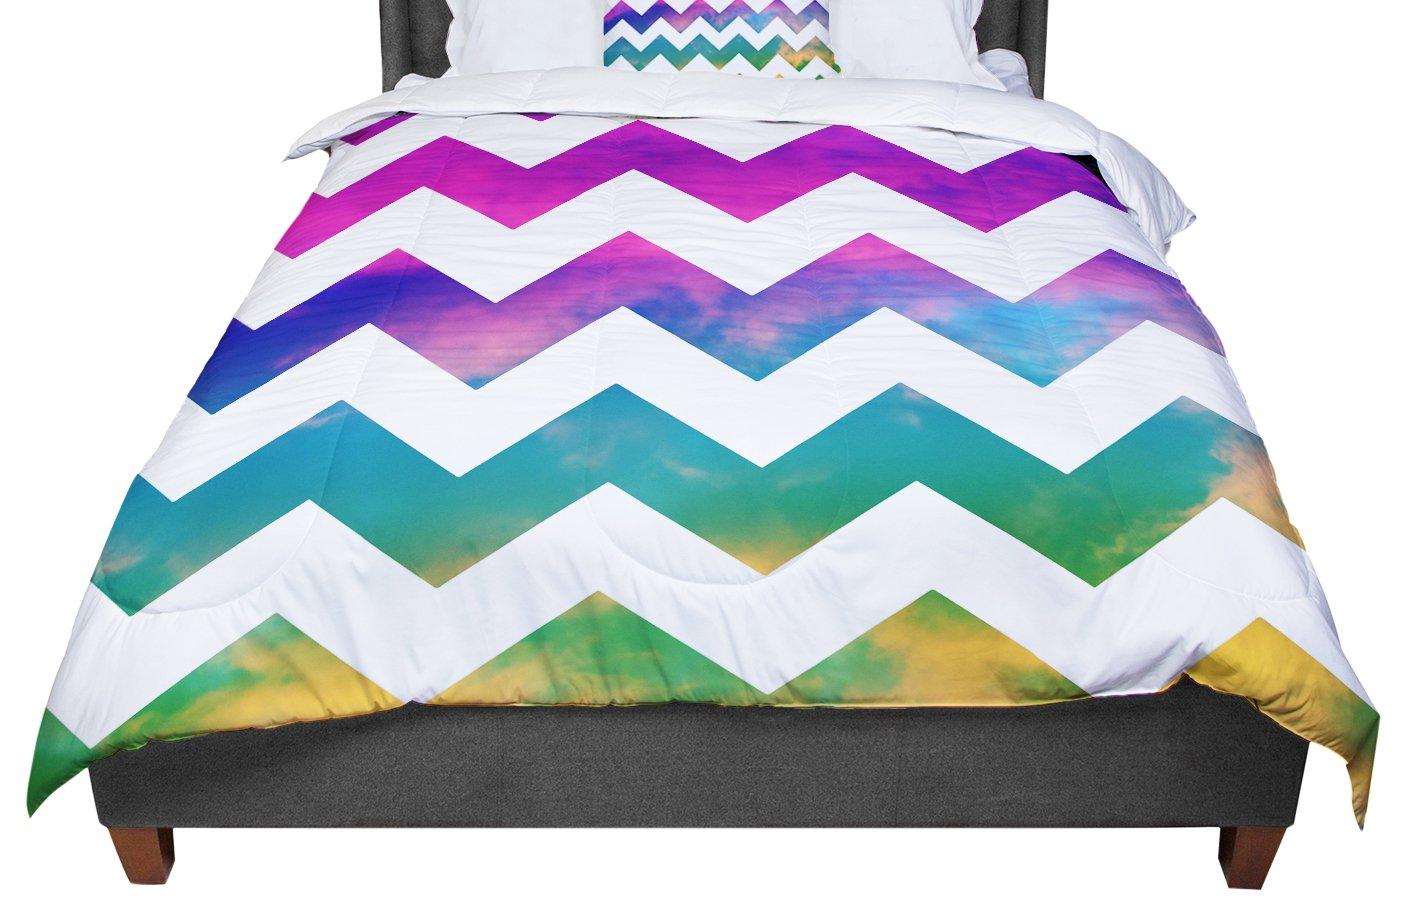 KESS InHouse Beth Engel Lucky Chevron Twin Comforter 68 X 88